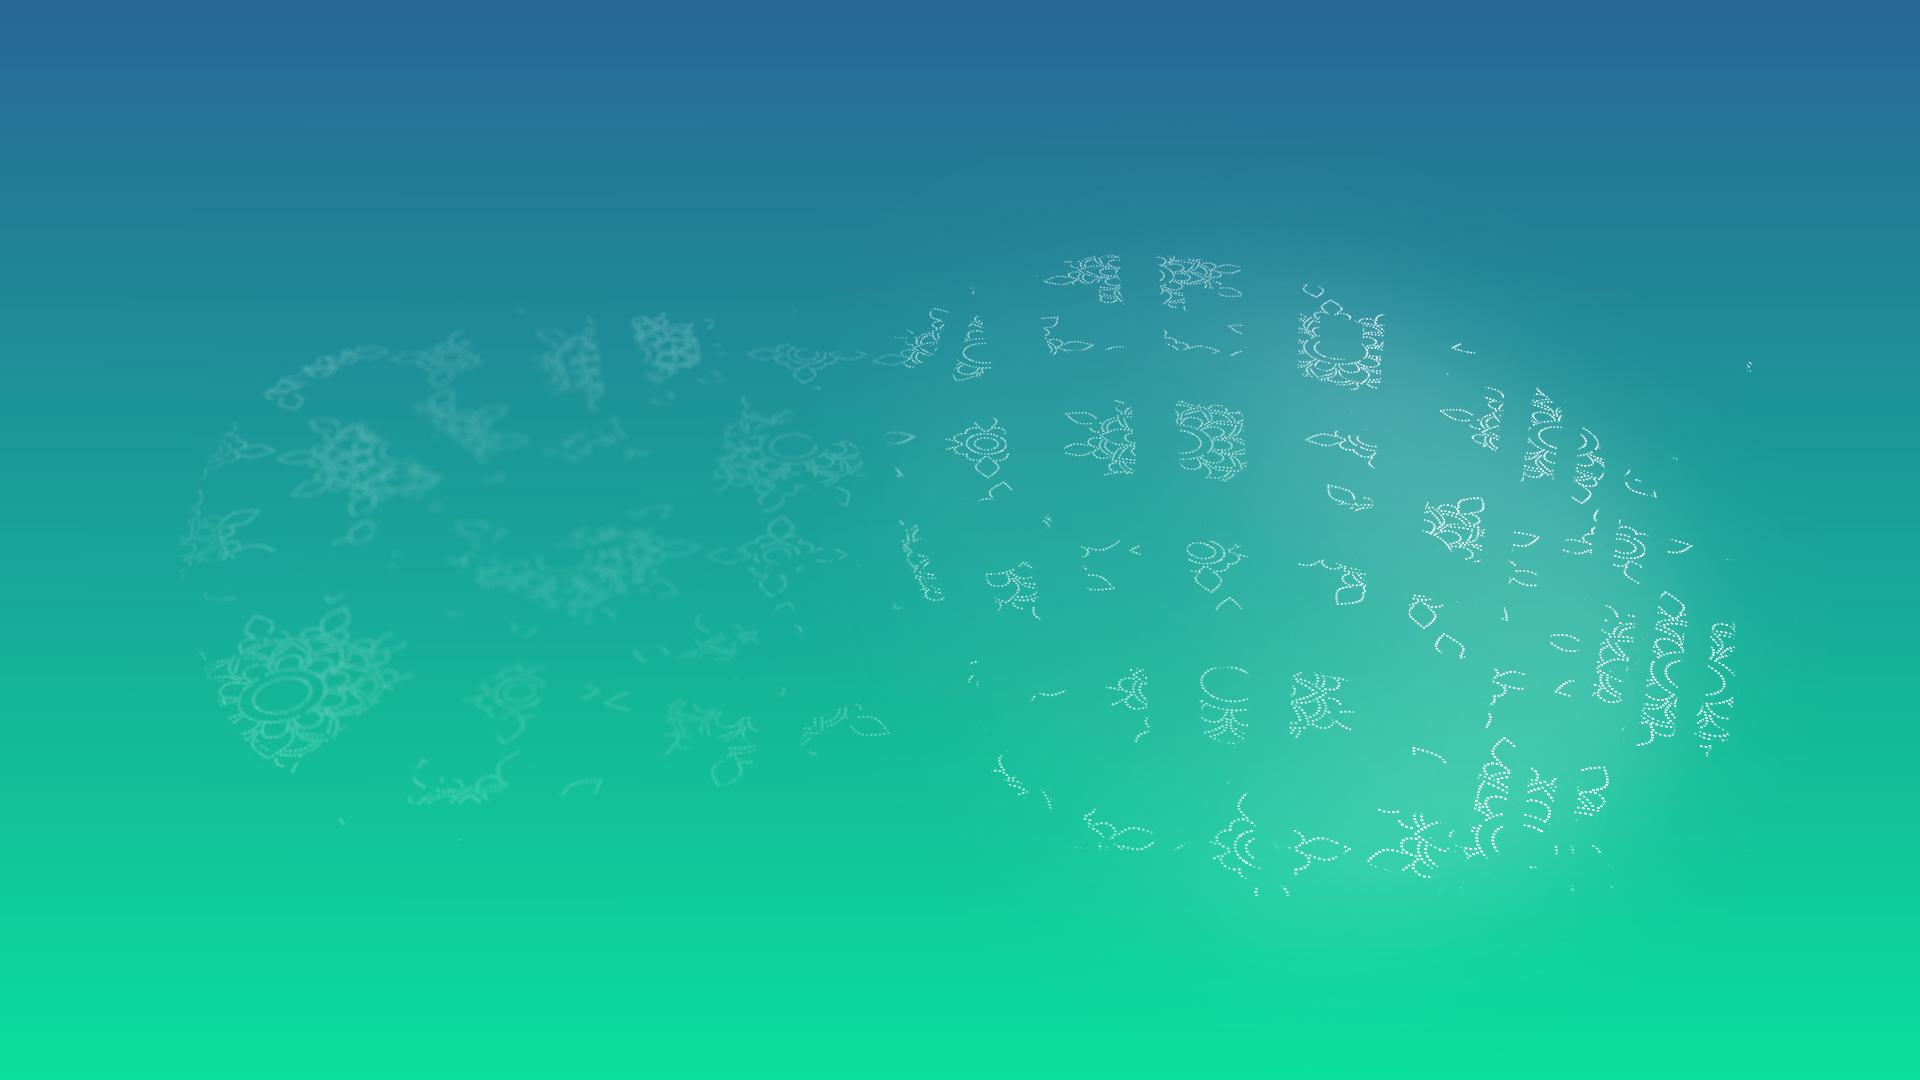 TRX0019_StyeFrameTests003-16.jpg